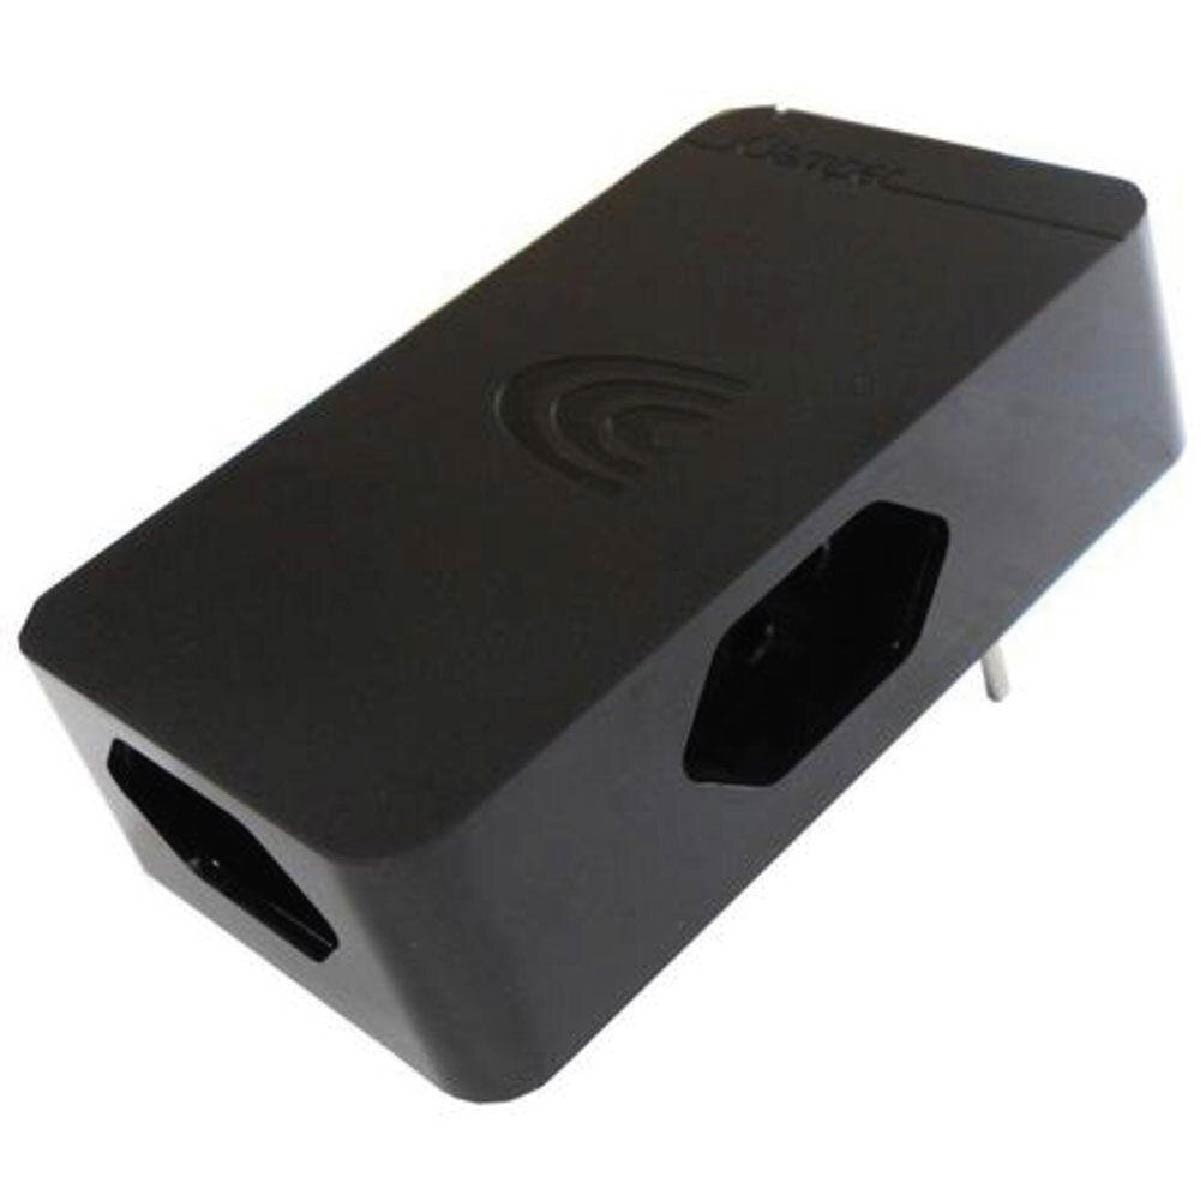 Filtro de Linha iClamper Energia 3 Protetor Contra Surtos e Raios Preto